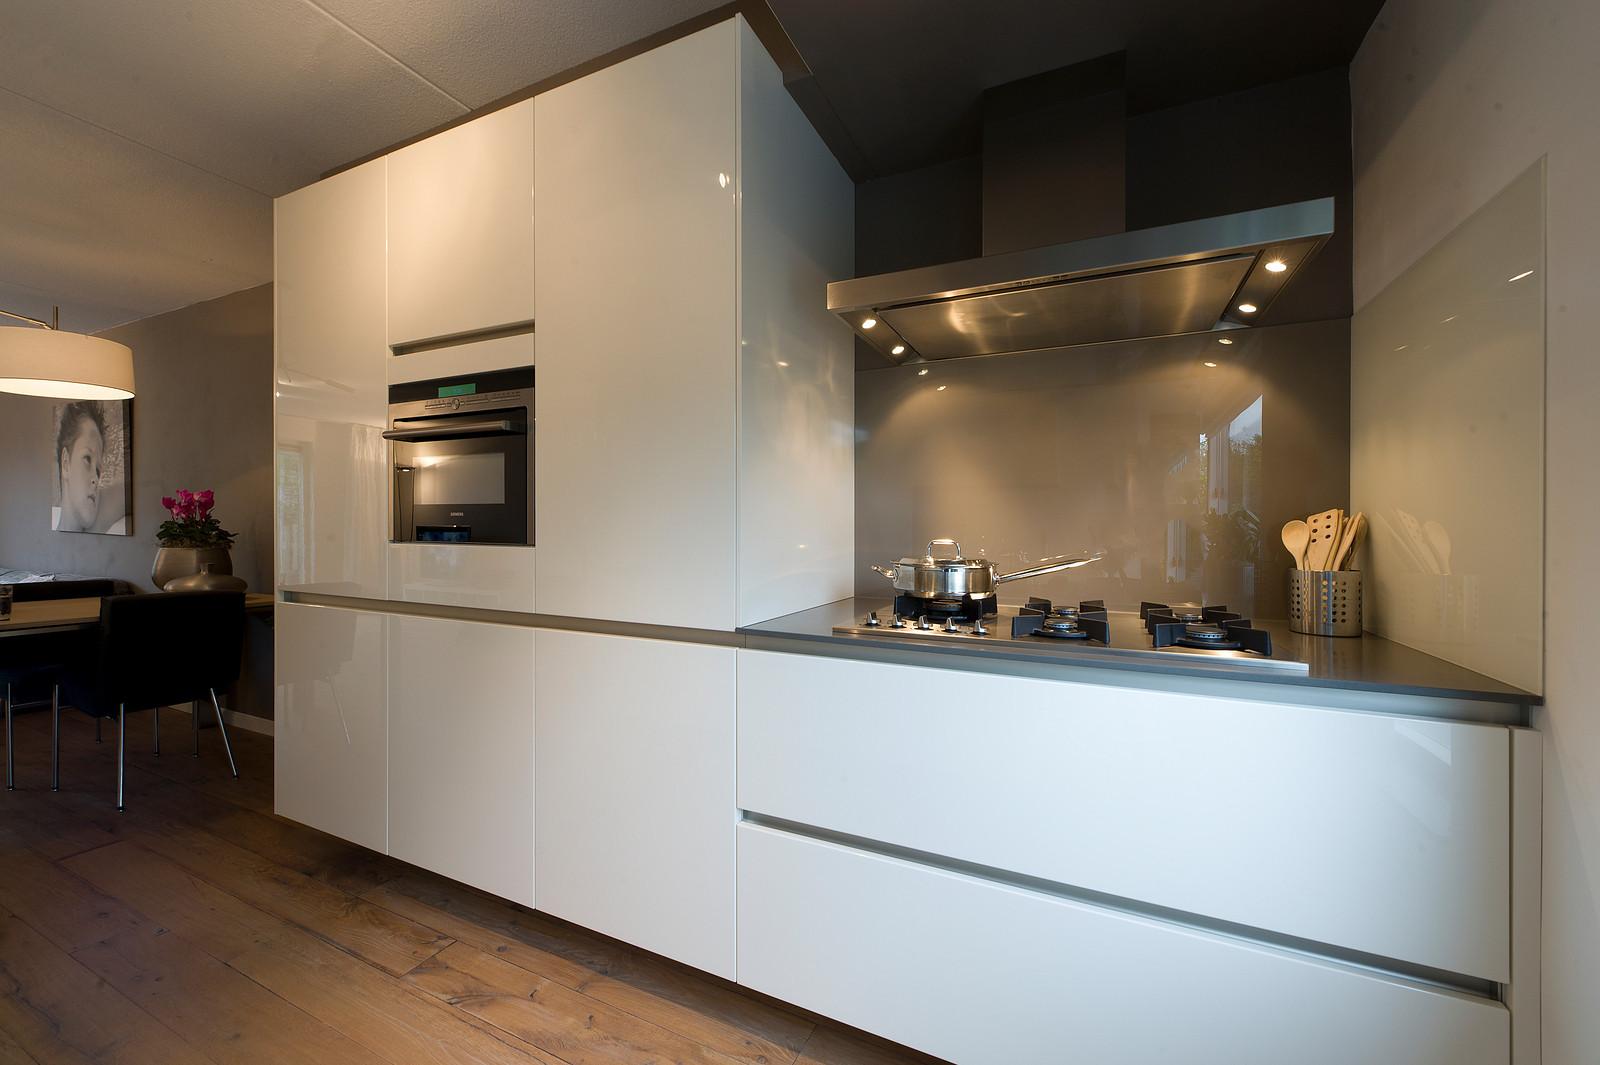 glanzend witte keuken